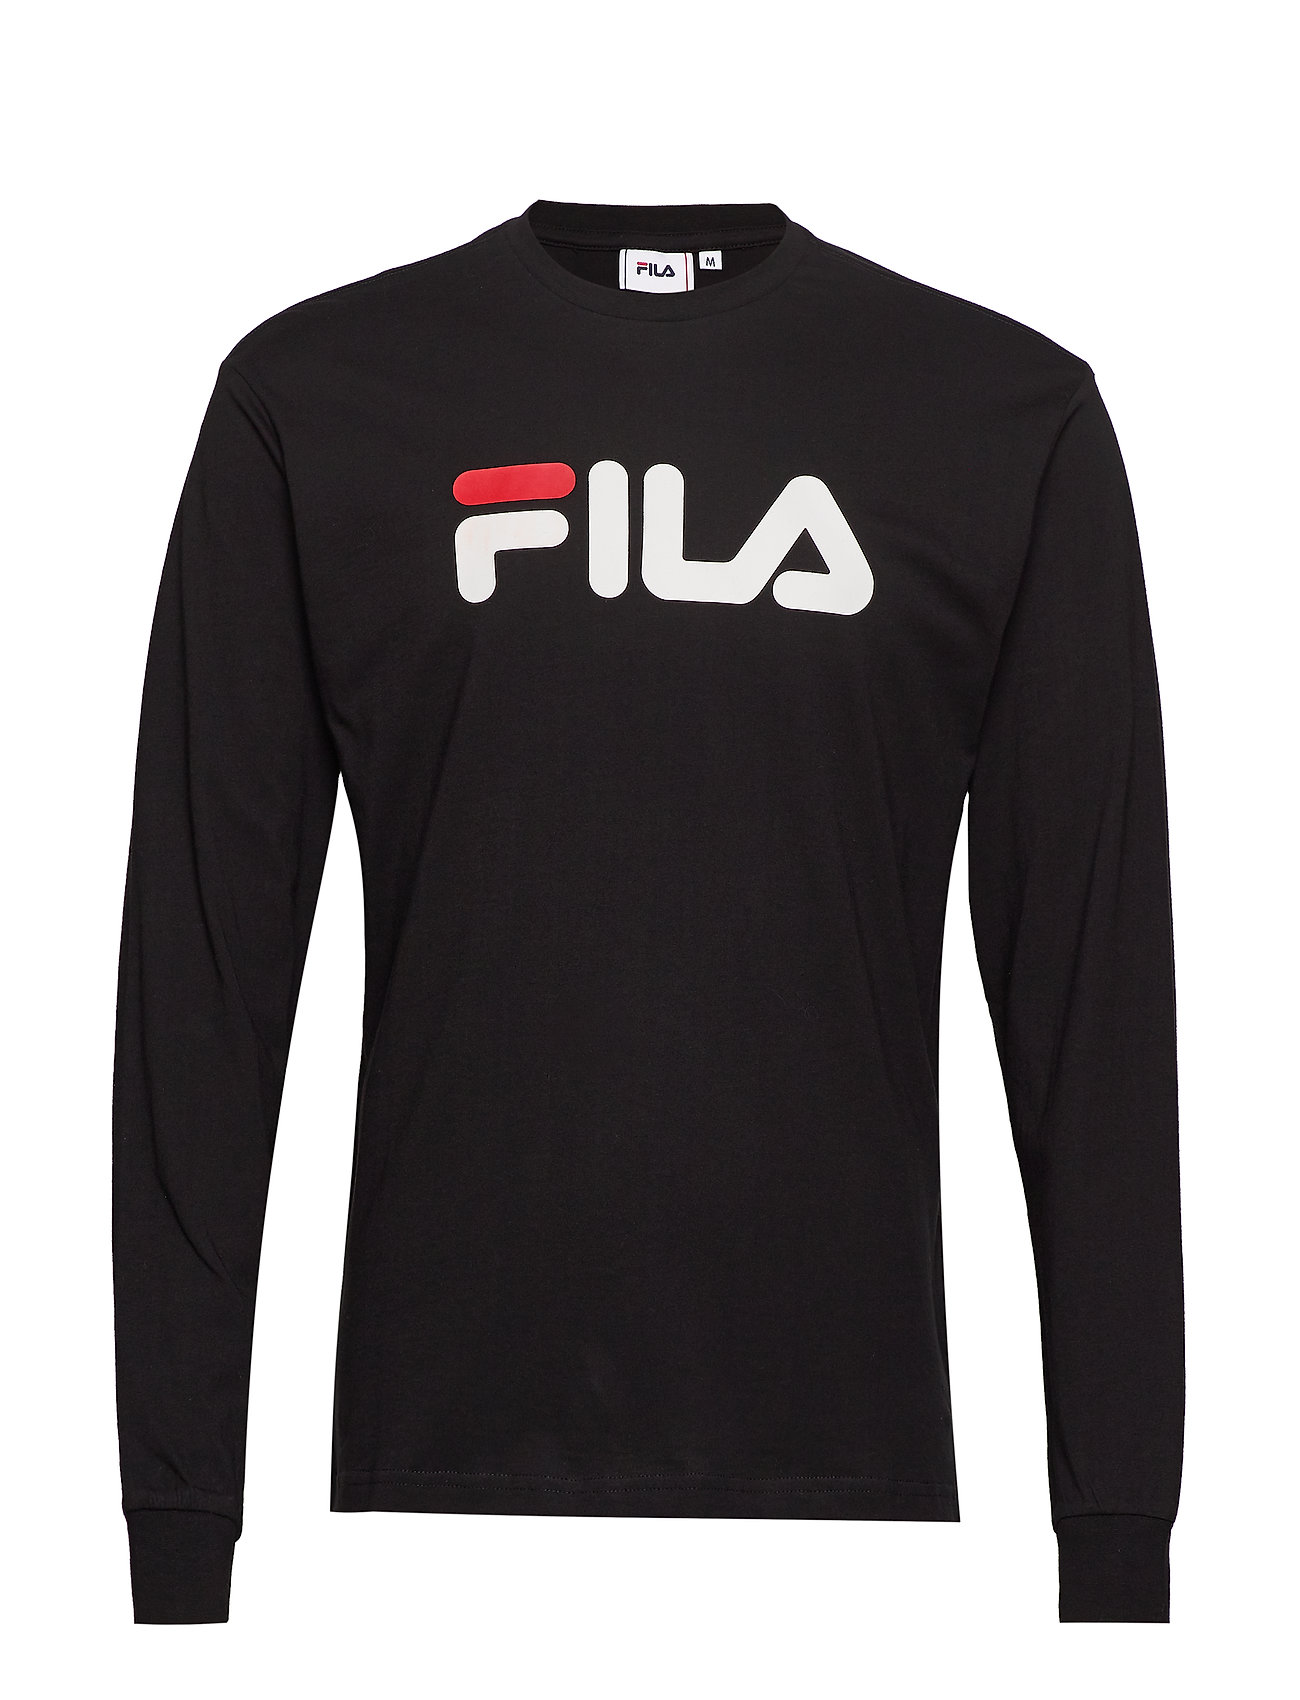 FILA Unisex Classic Pure Long Sleeve Shirt T-Langärmliges Hemd Schwarz FILA